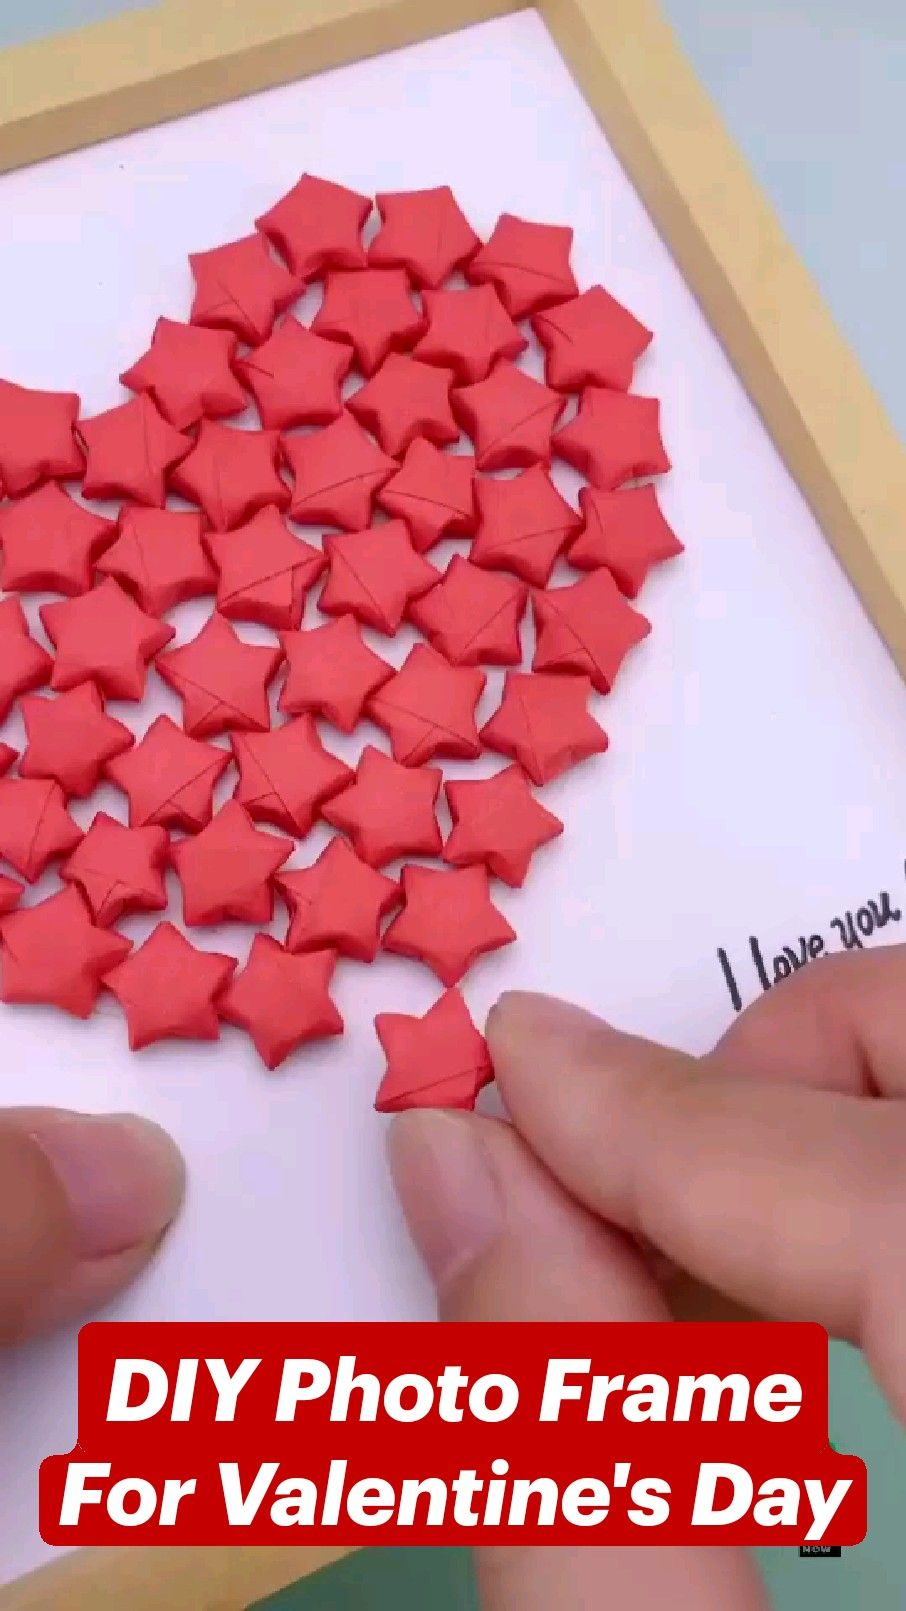 DIY Photo Frame For Valentine's Day